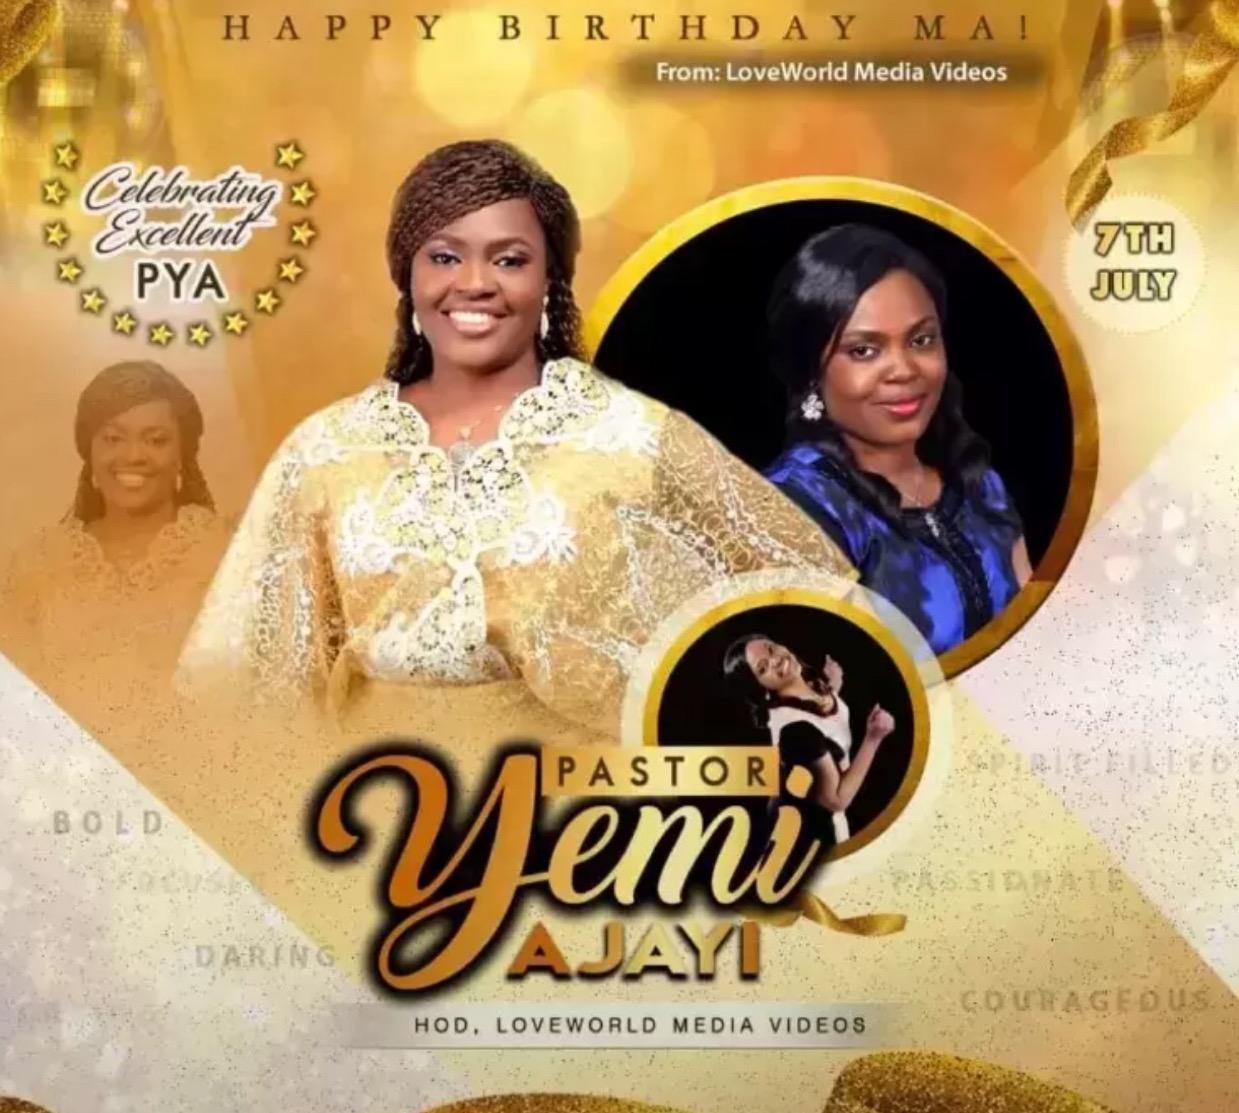 Happy birthday Pastor Yemi, congratulations